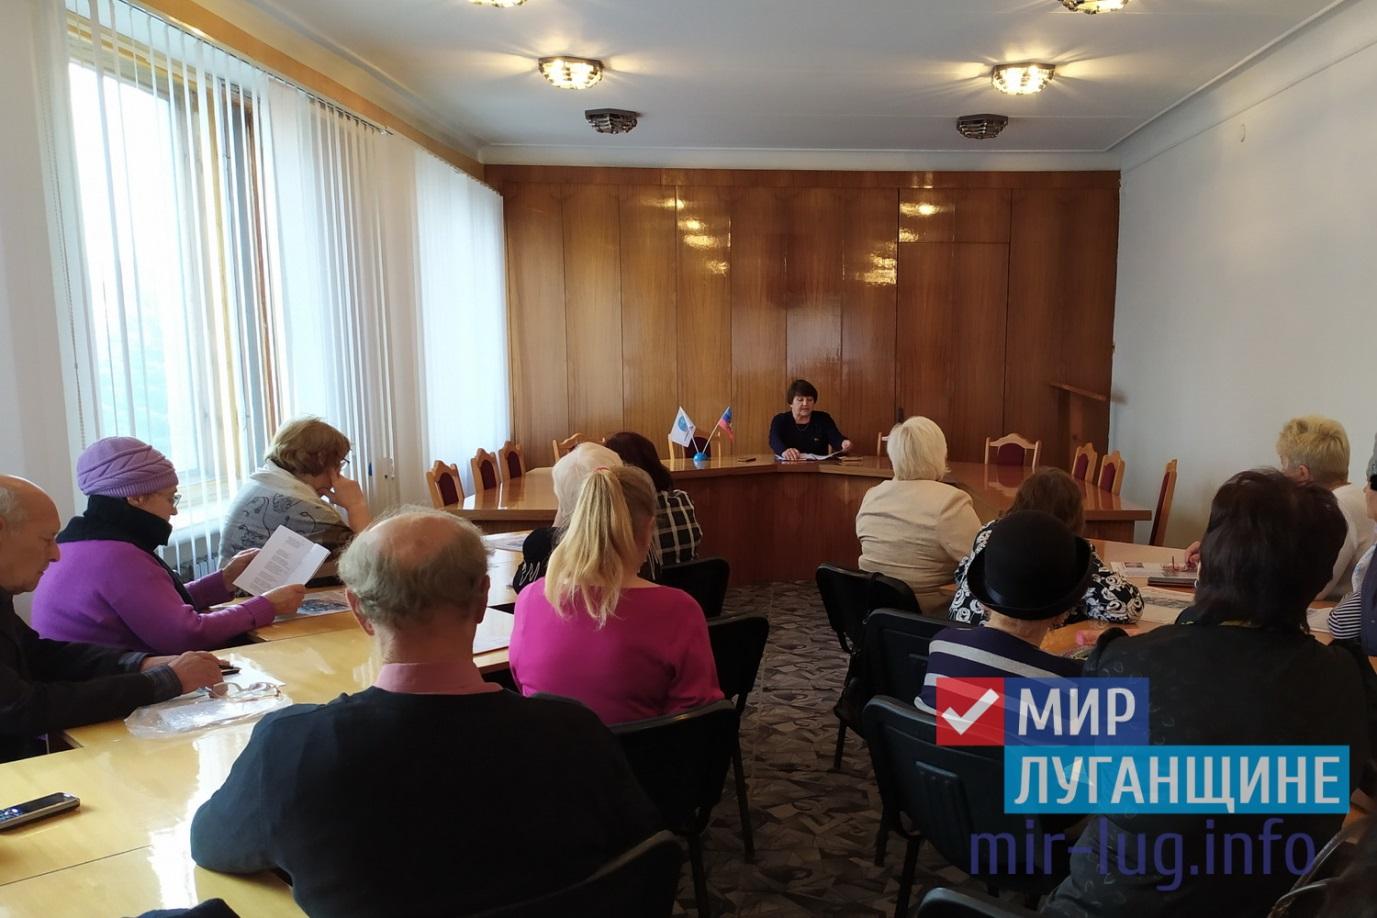 Депутат Народного совета ЛНР Елена Рахмукова встретилась с жителями Антрацита 2